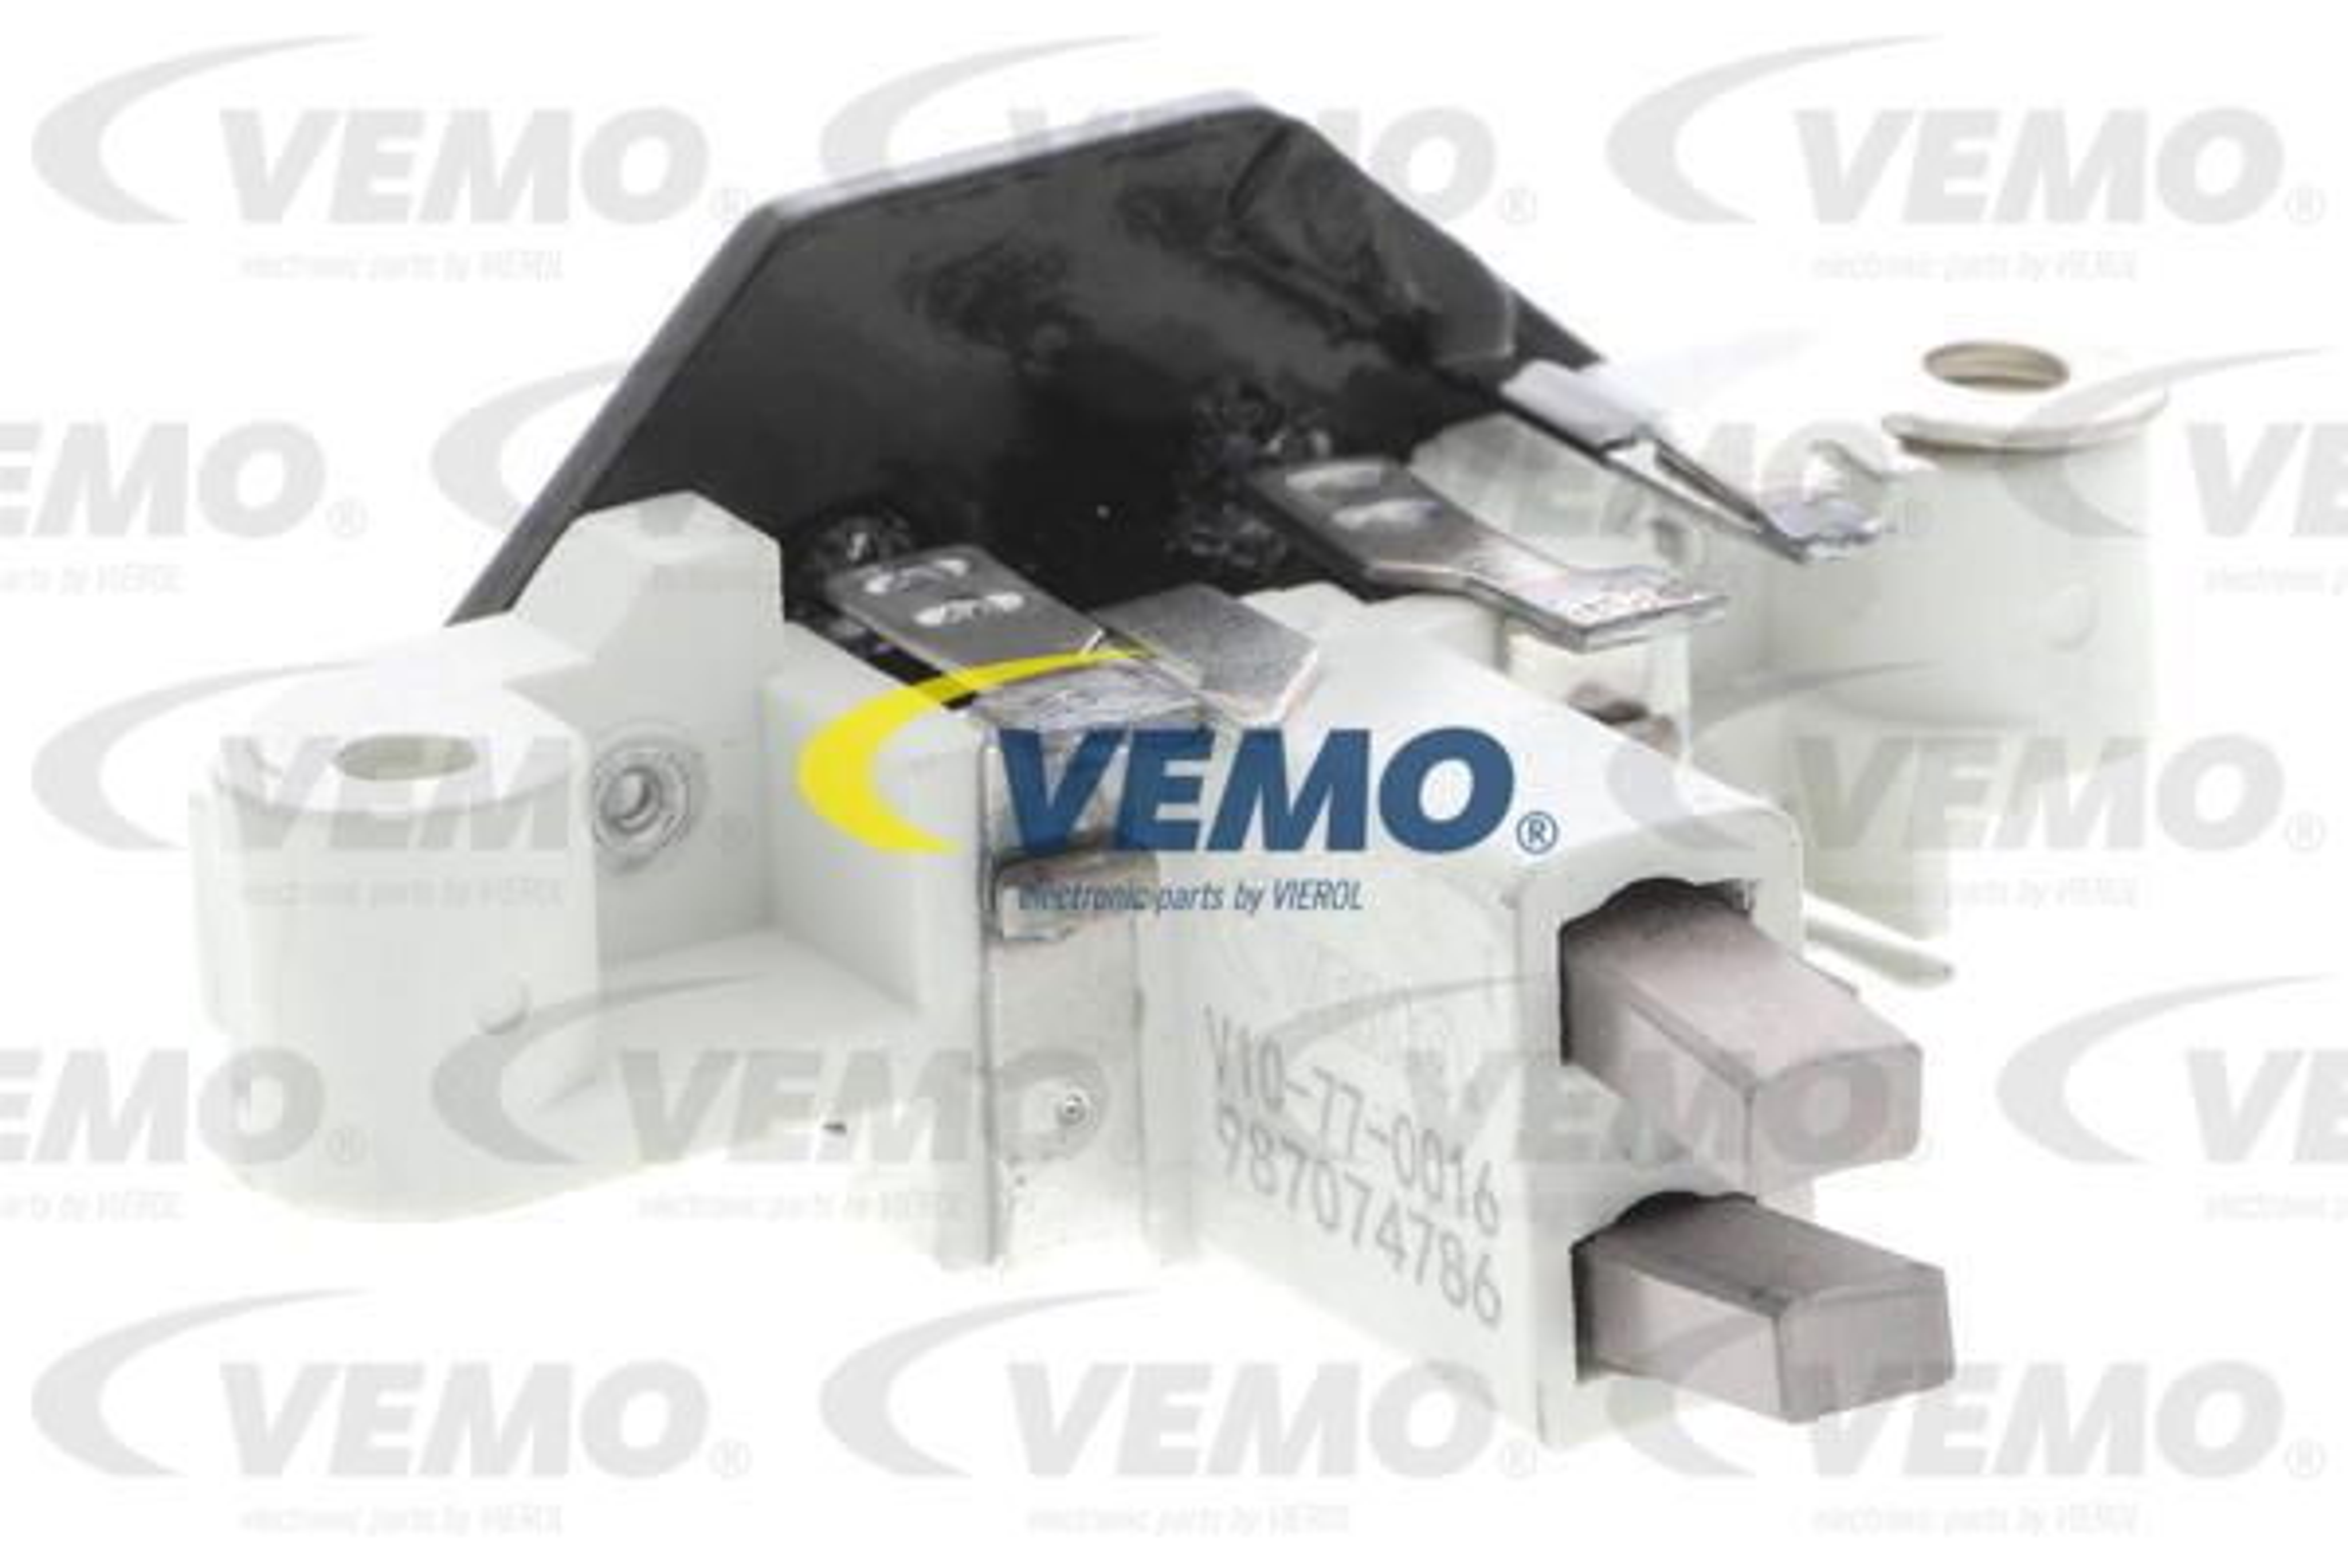 NISSAN VERSA Regler Lichtmaschine - Original VEMO V10-77-0016